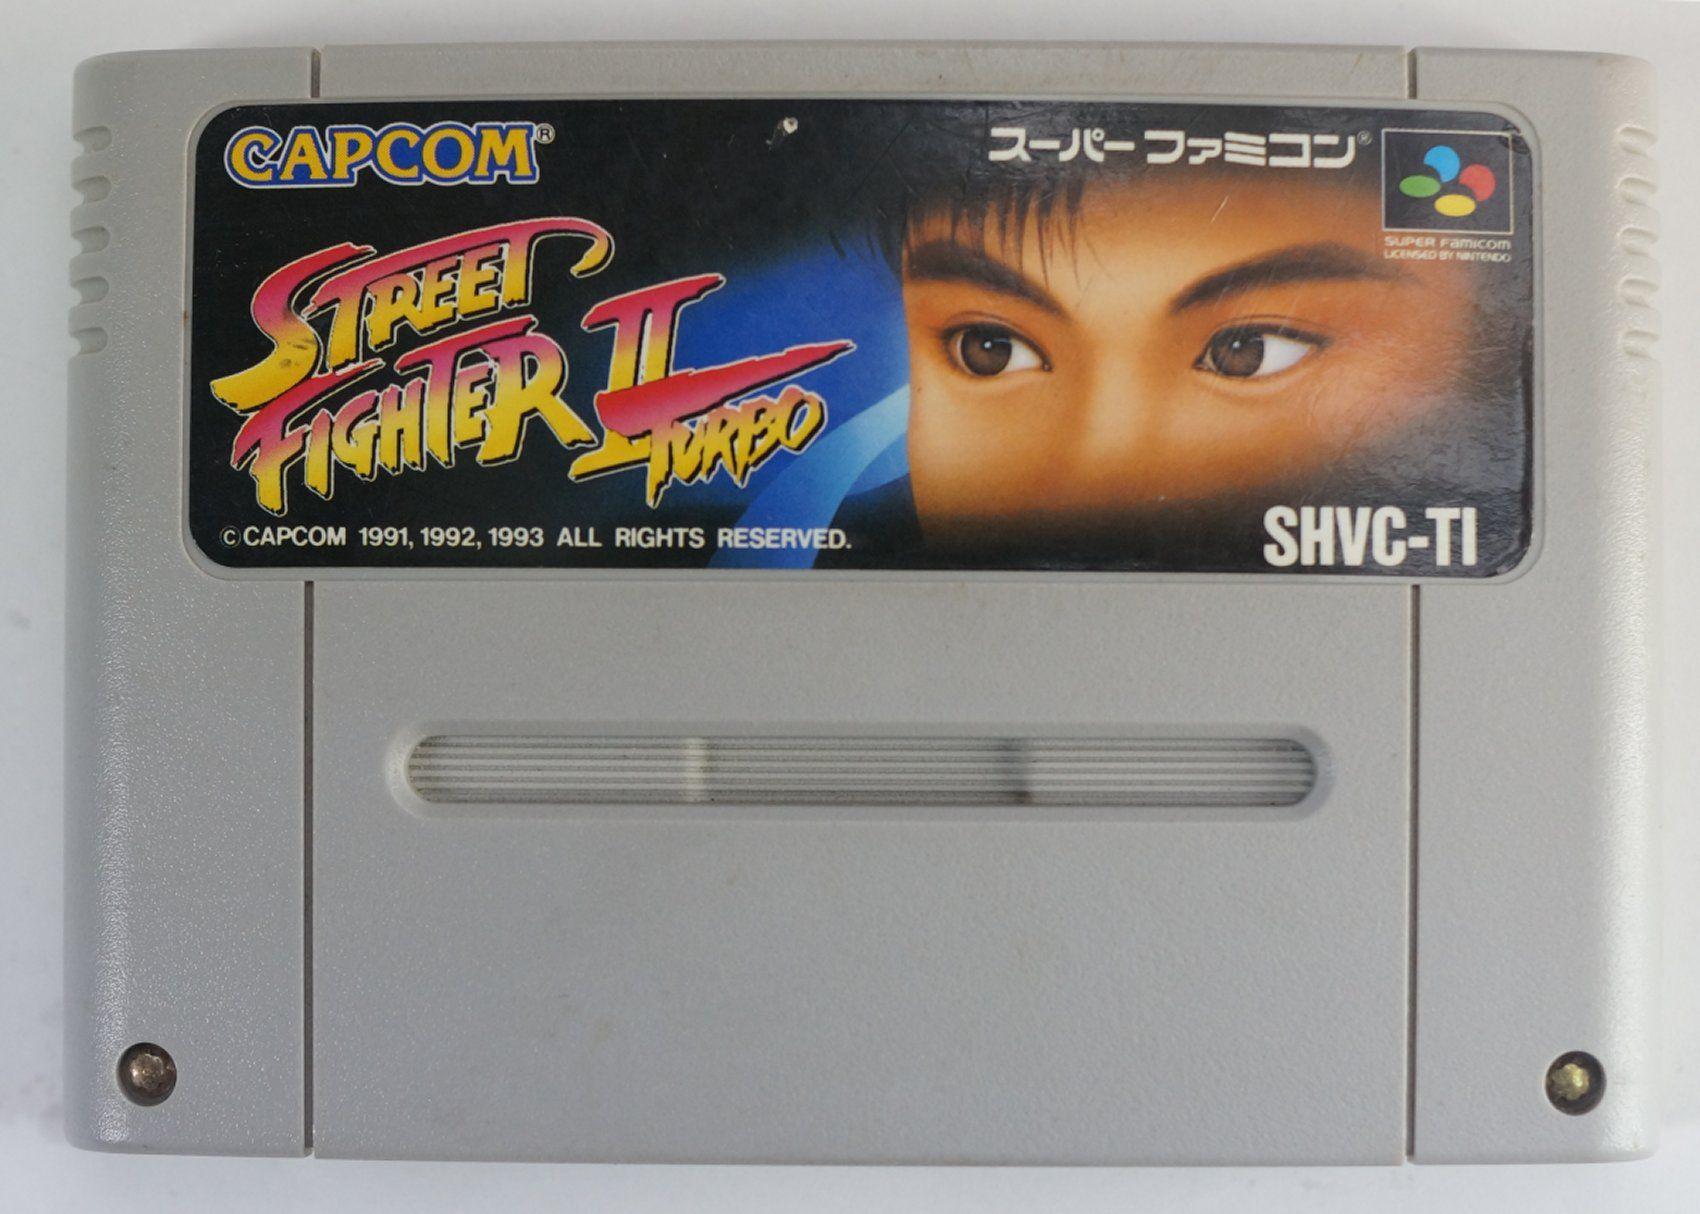 Super #Famicom :  Super Famicom : Street Fighter II Turbo SHVC-TI http://www.japanstuff.biz/ CLICK THE FOLLOWING LINK TO BUY IT ( IF STILL AVAILABLE ) http://www.delcampe.net/page/item/id,0366378852,language,E.html